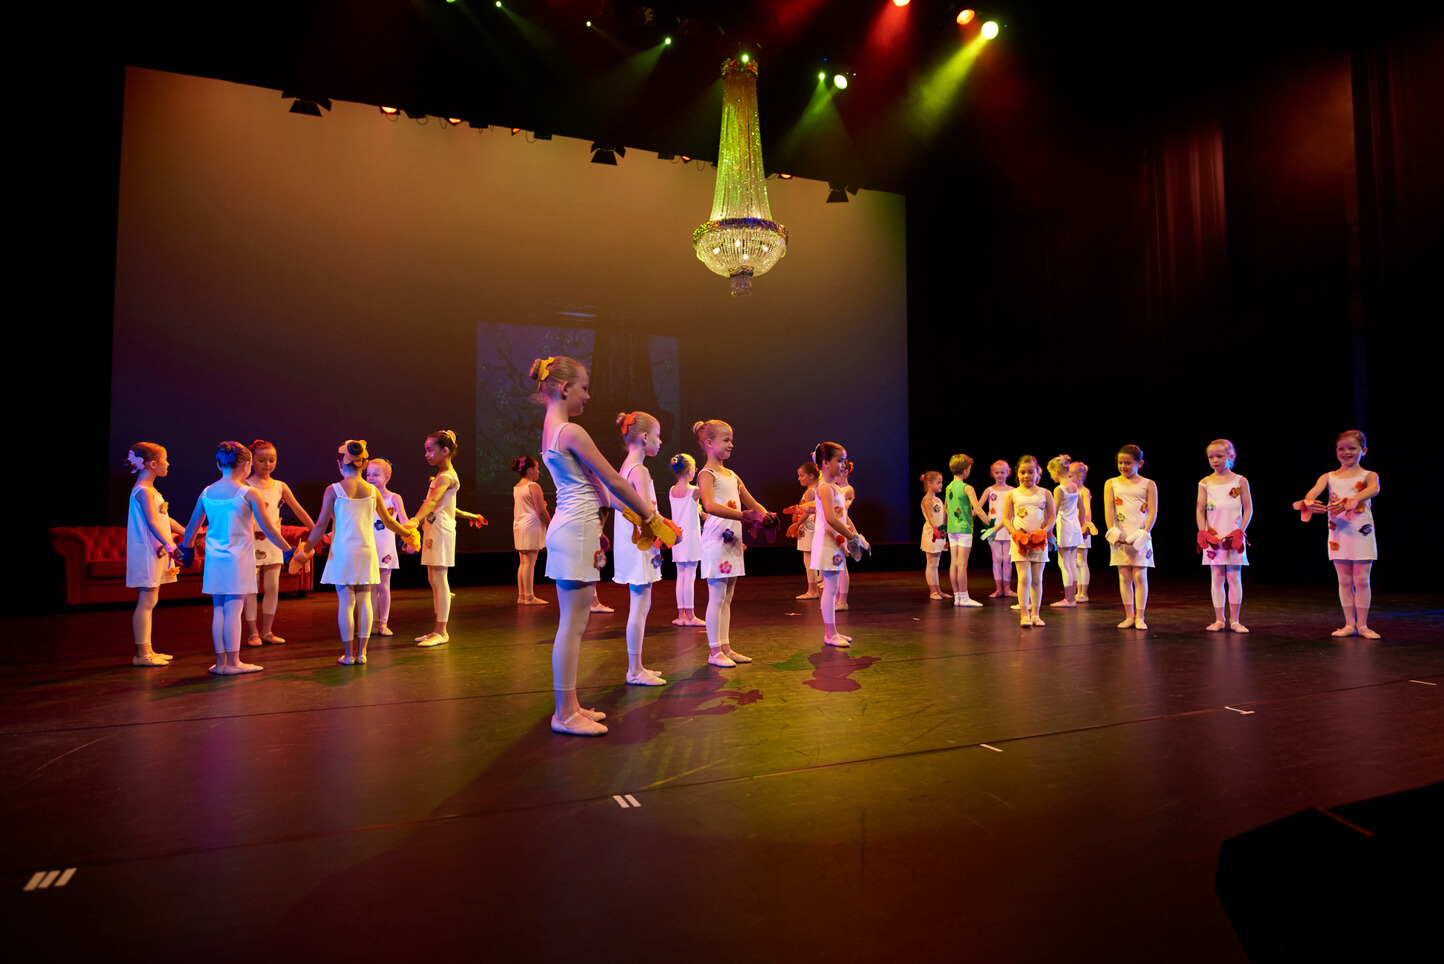 balletschool-heerhugowaard-dag